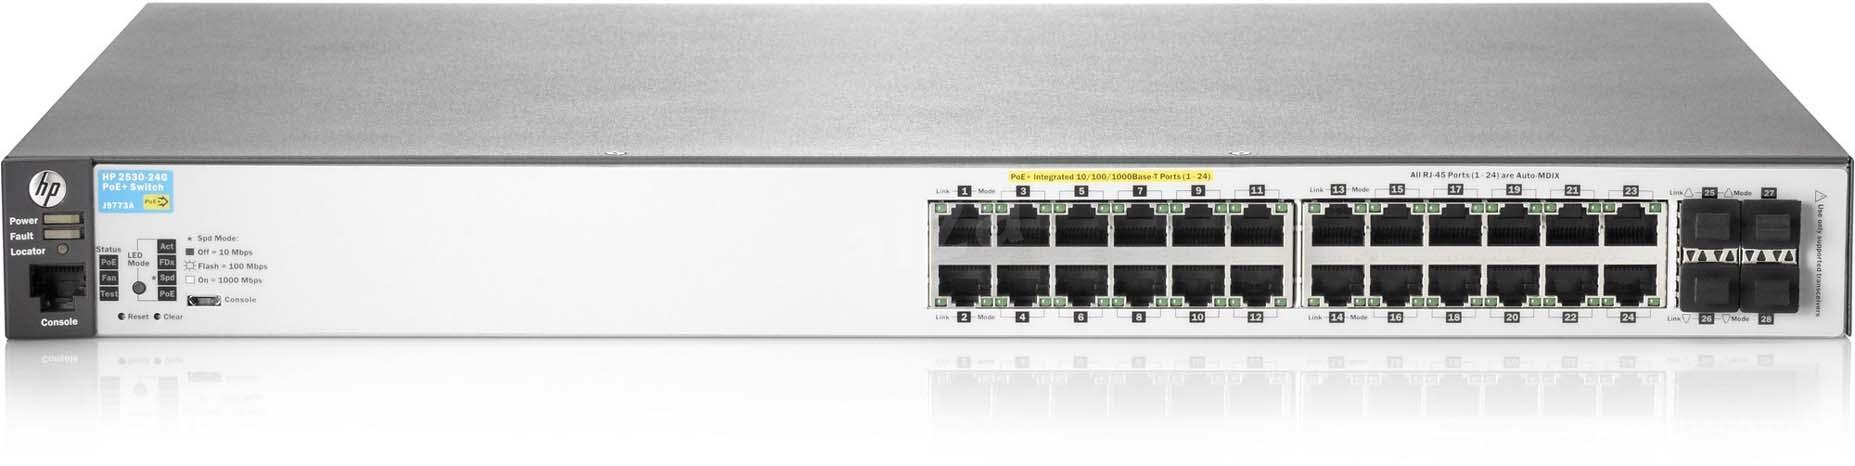 harga-hp-j9773a-2530-24g-4poe-switch-24-